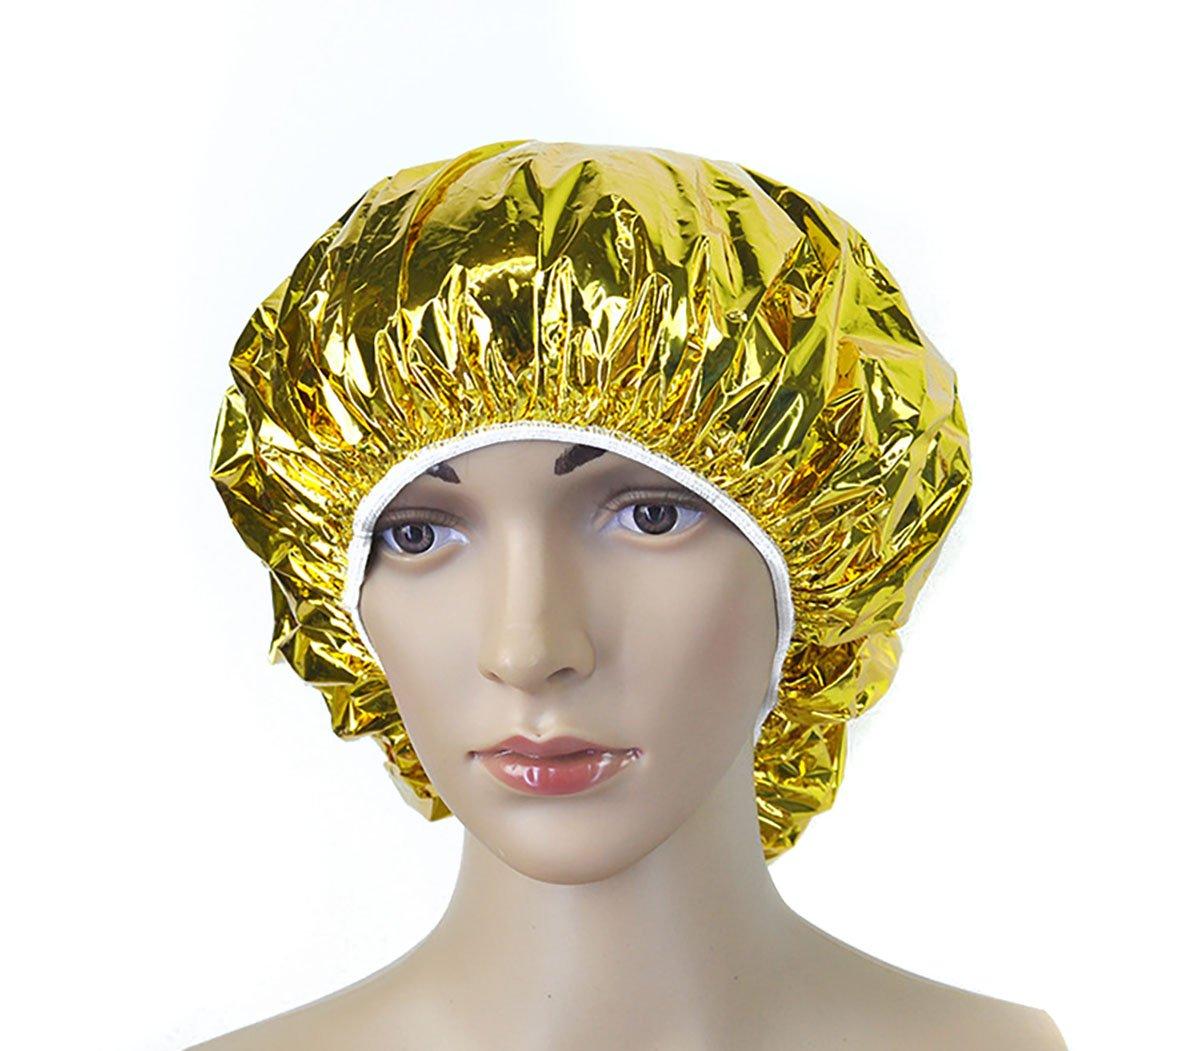 4PCS Salon Aluminum Foil Baking Oil Hair Cap Portable Nourishing Dry Disposable Shower Cap Waterproof Ultra-thin Bath Hat Hoods Bathroom Products (Gold) Flyott